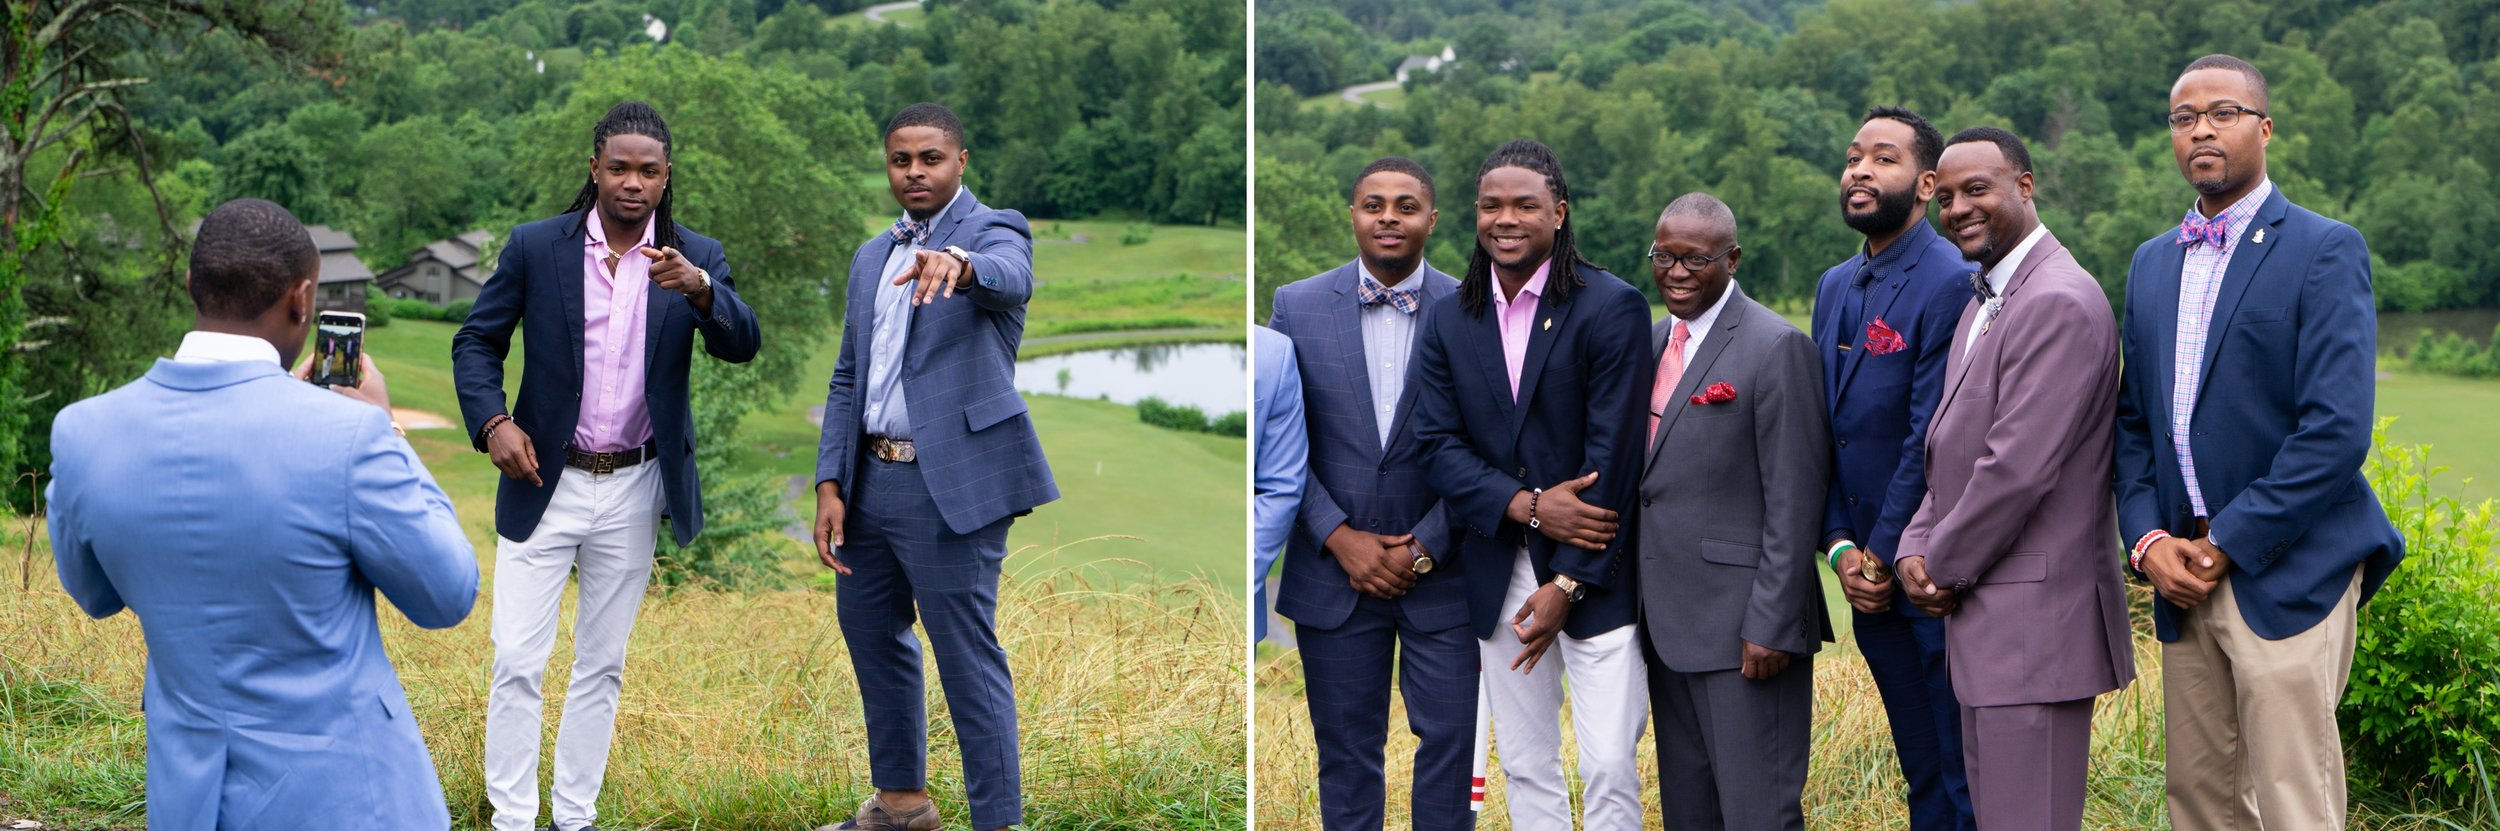 High Vista Weddings - Asheville Wedding 2 35.jpg